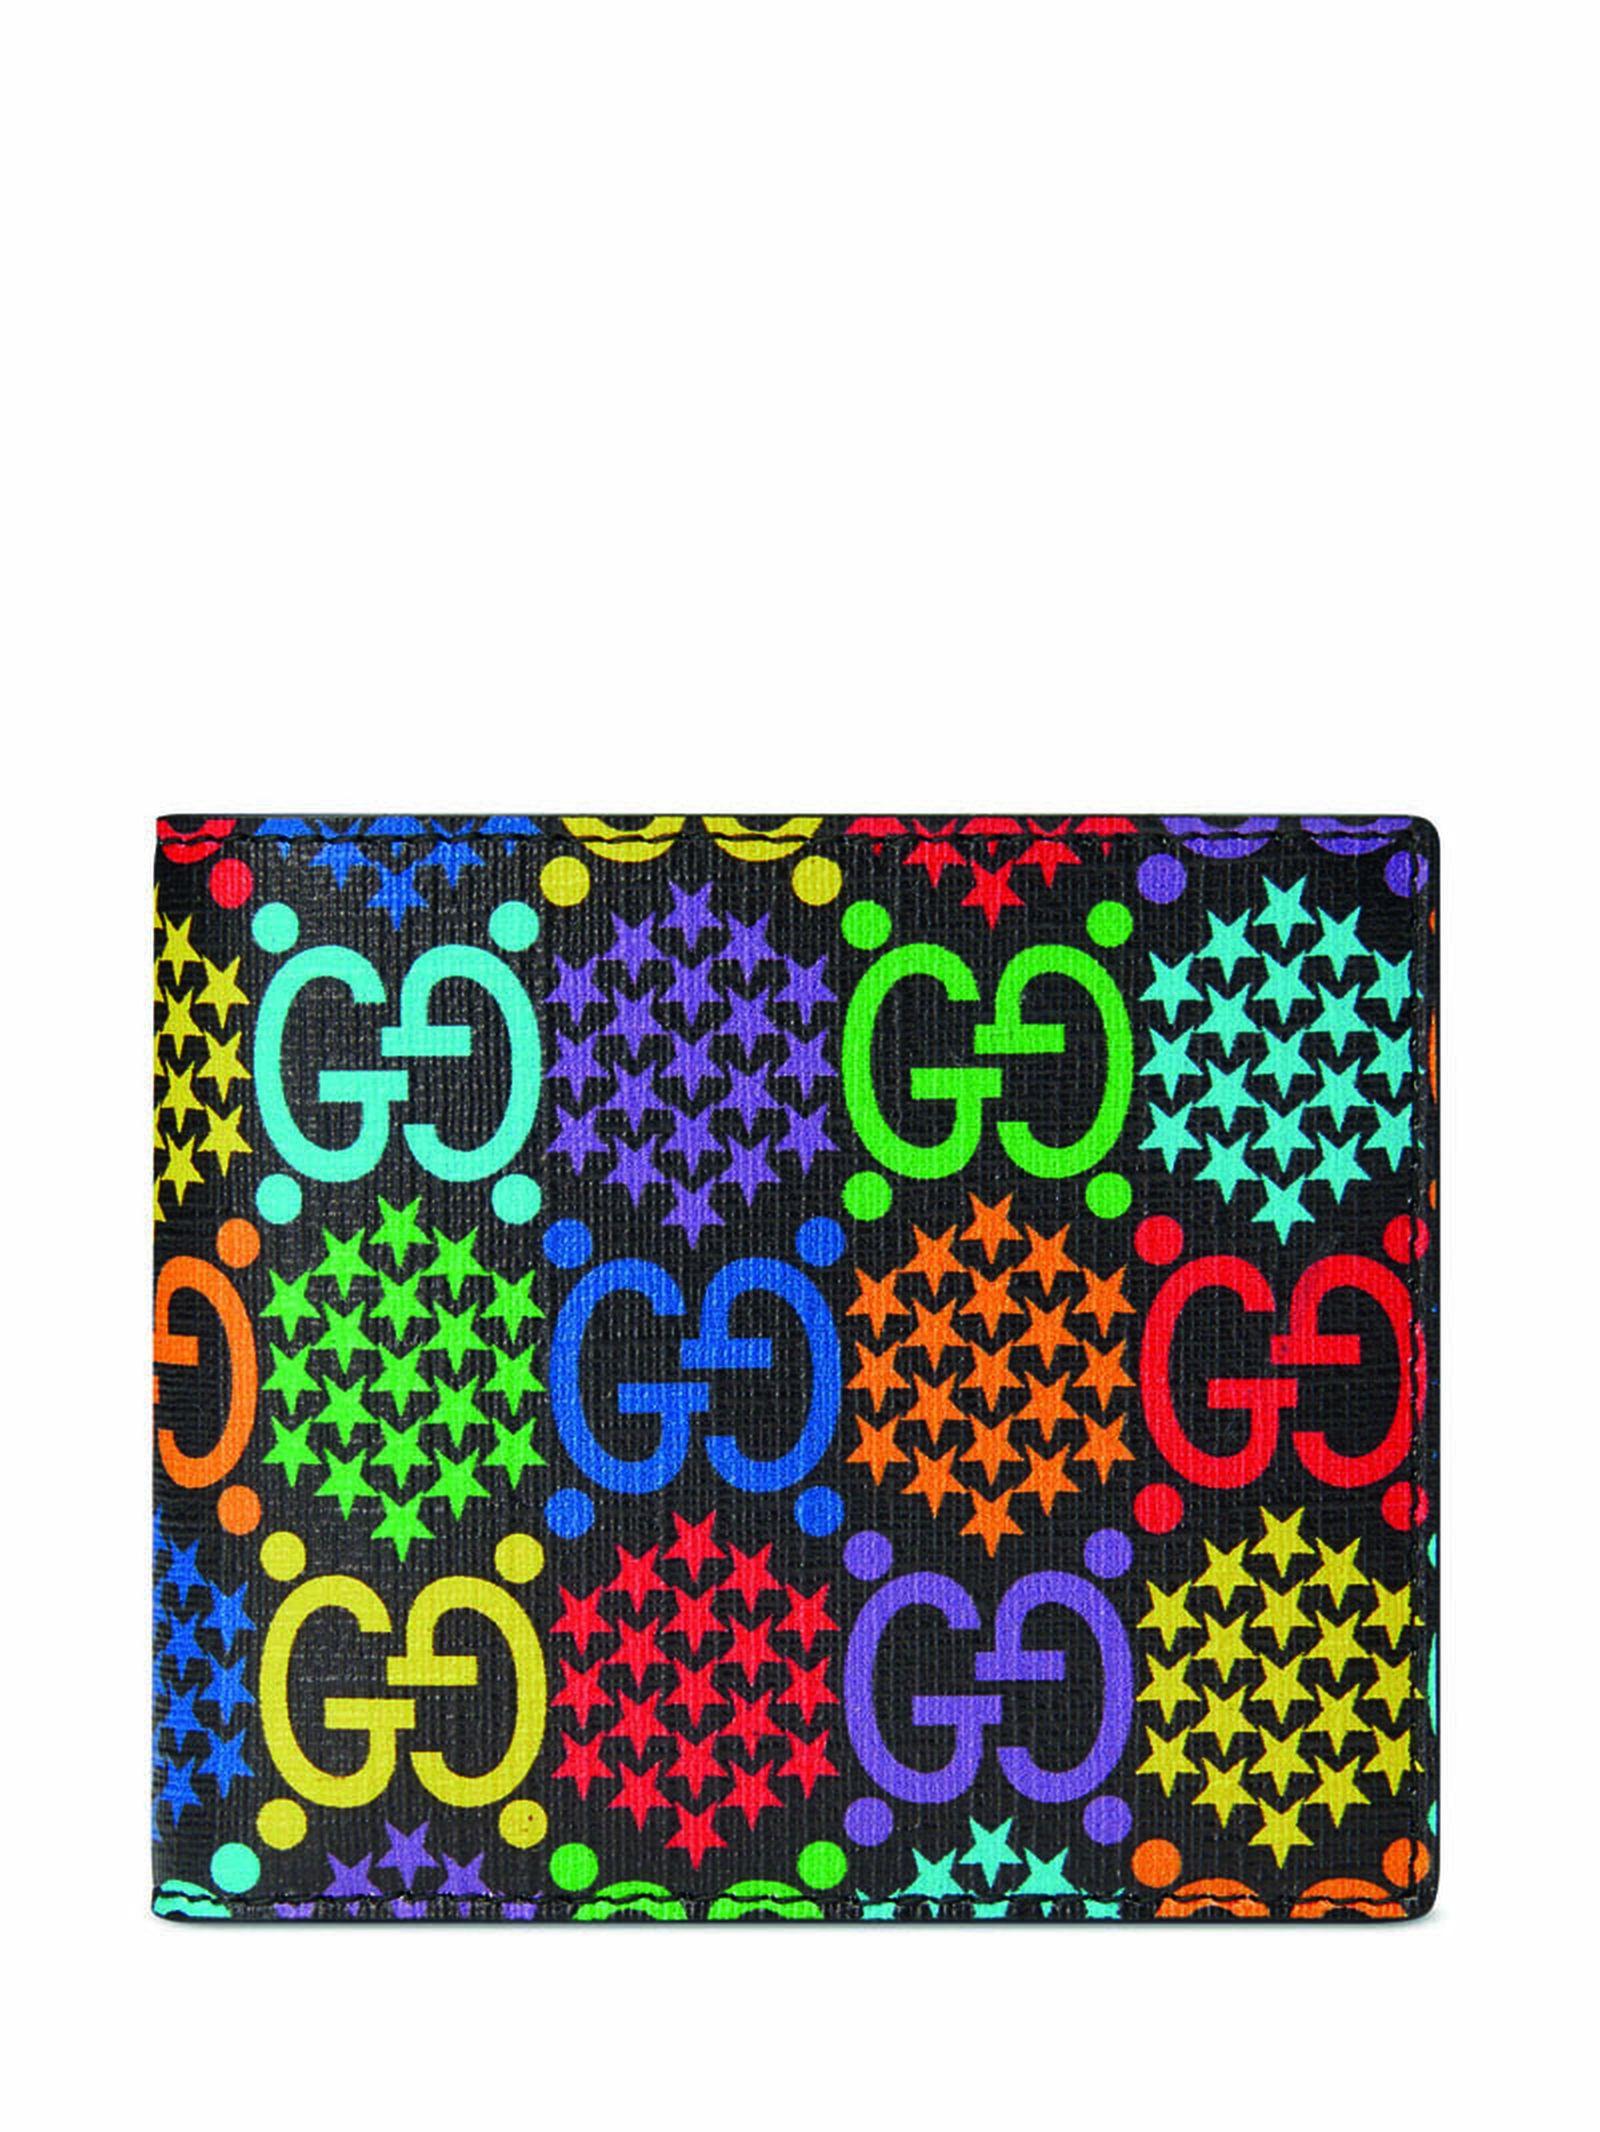 13gucci-psychedelics-pop-up